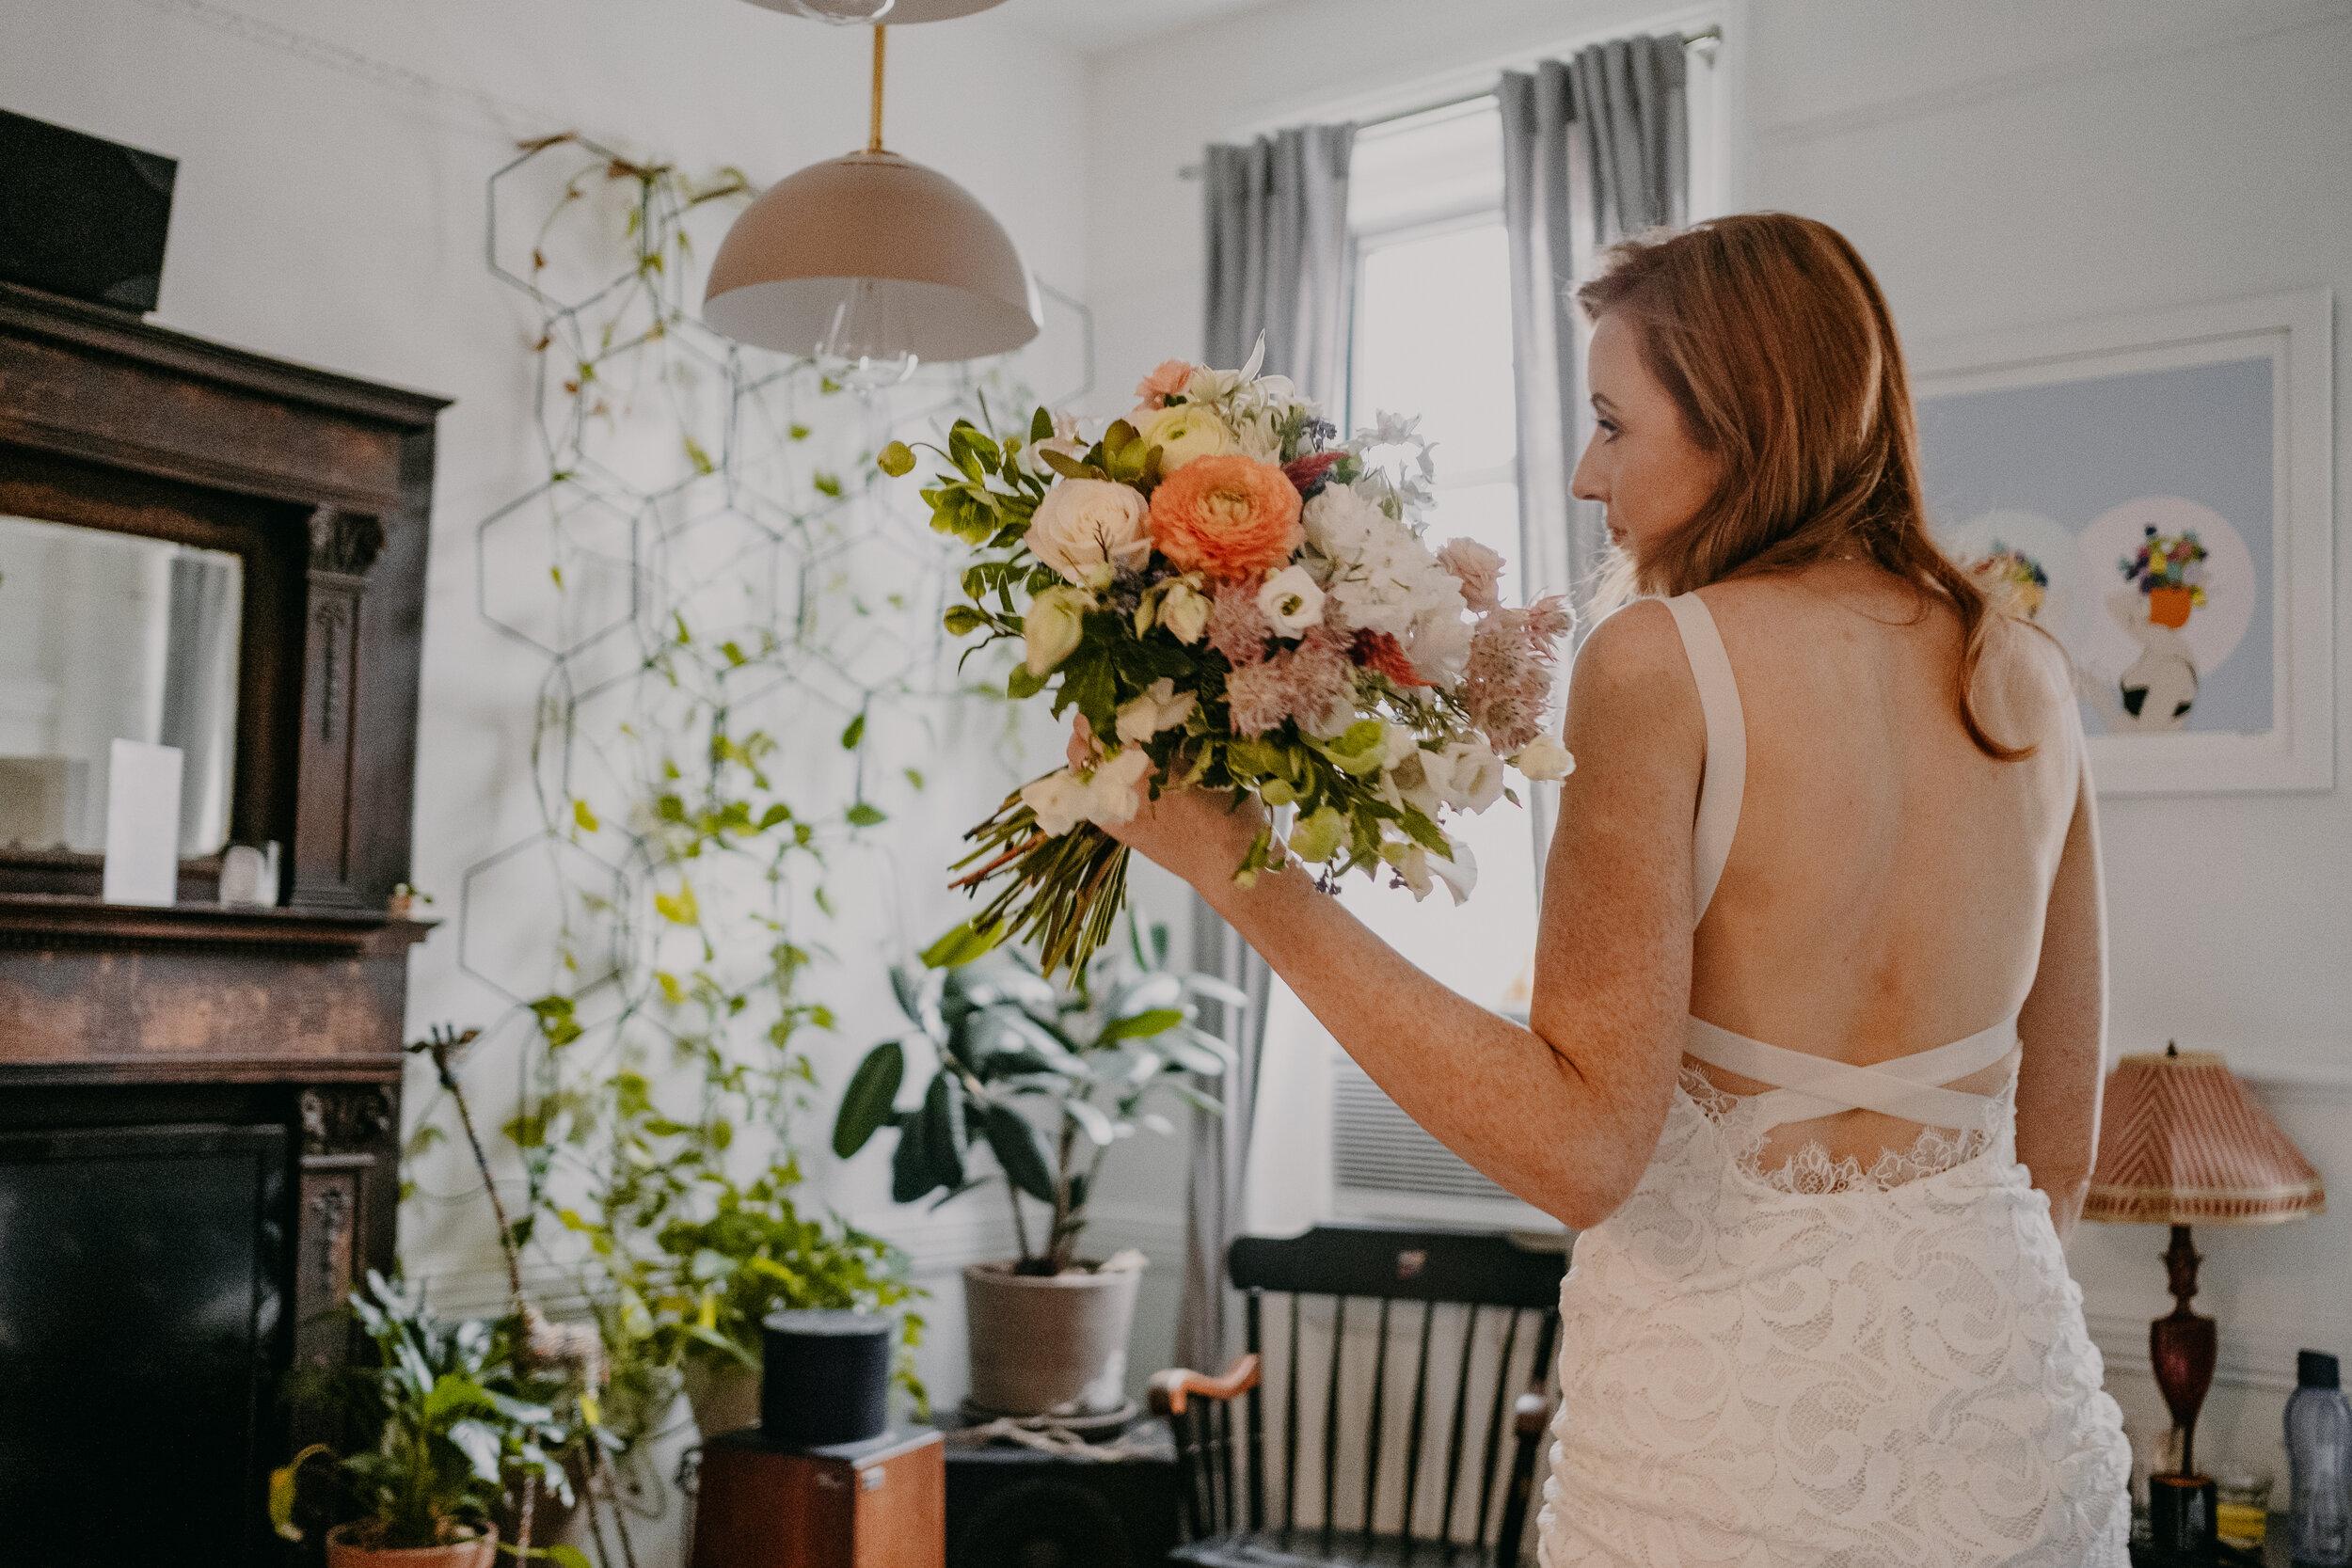 Aurora_Brooklyn_Wedding_Photographer_Chellise_Michael_Photography-98.jpg